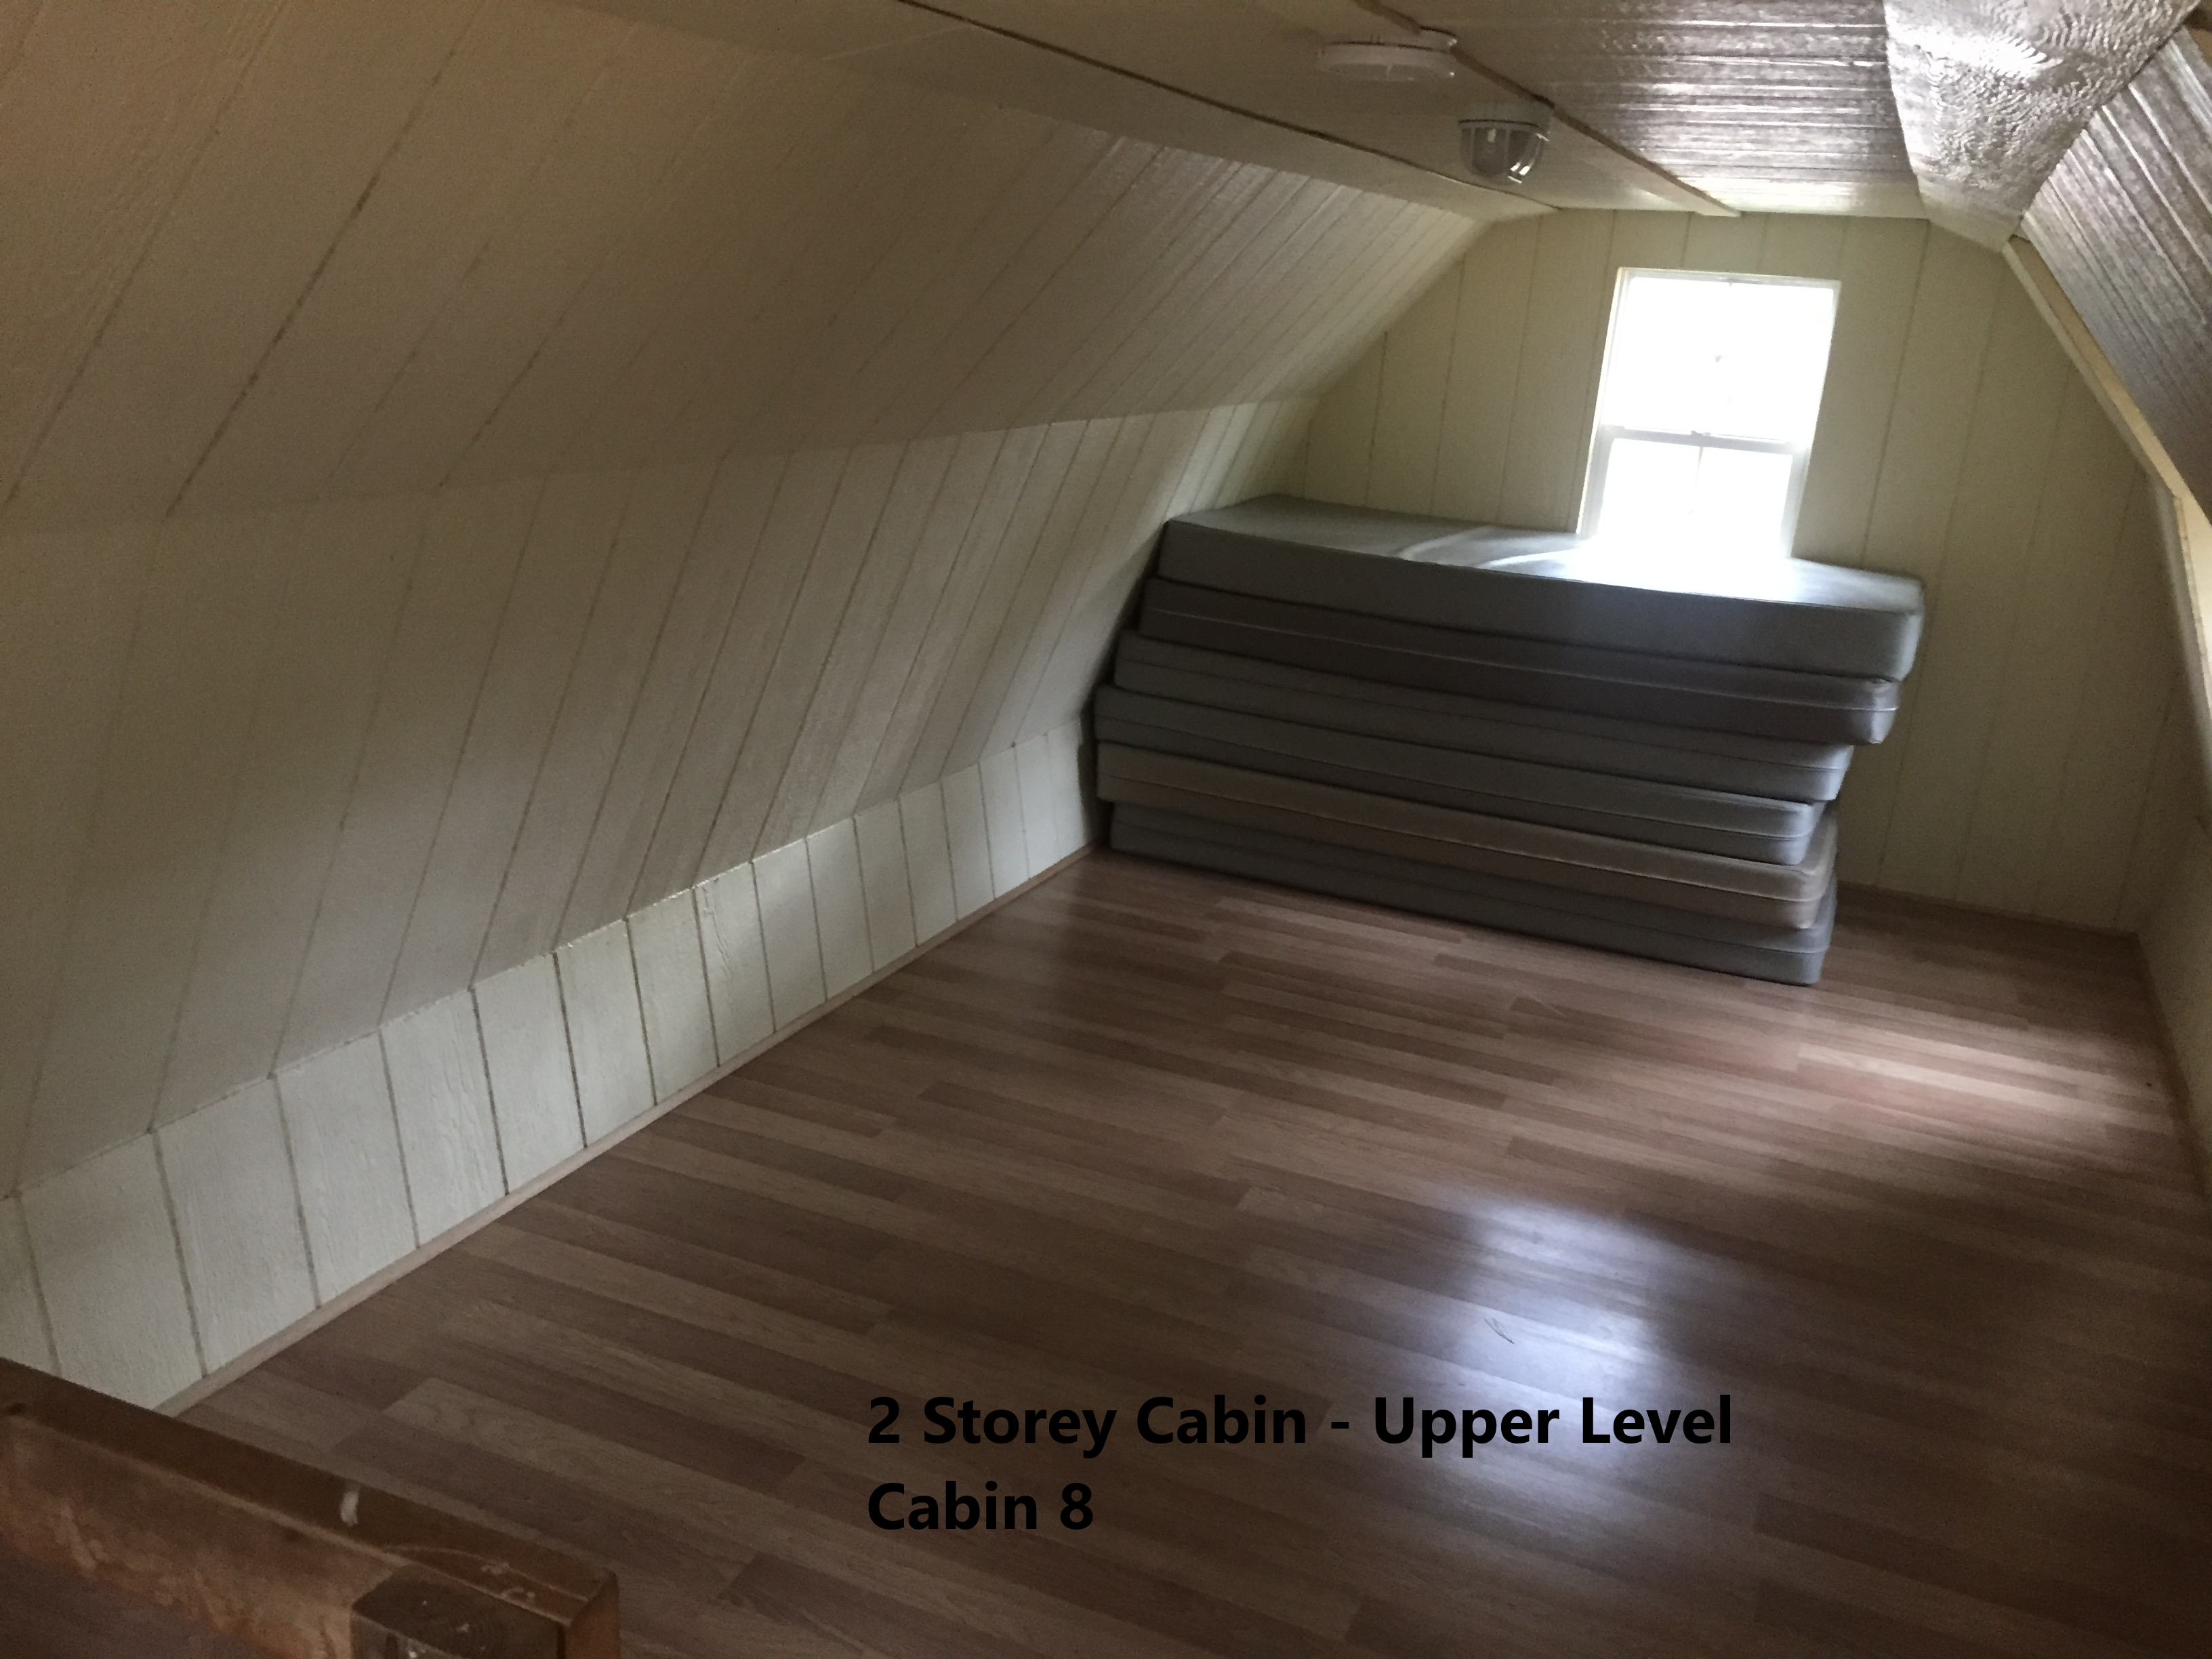 2 Storey Cabin Upper Level - Cabin 8